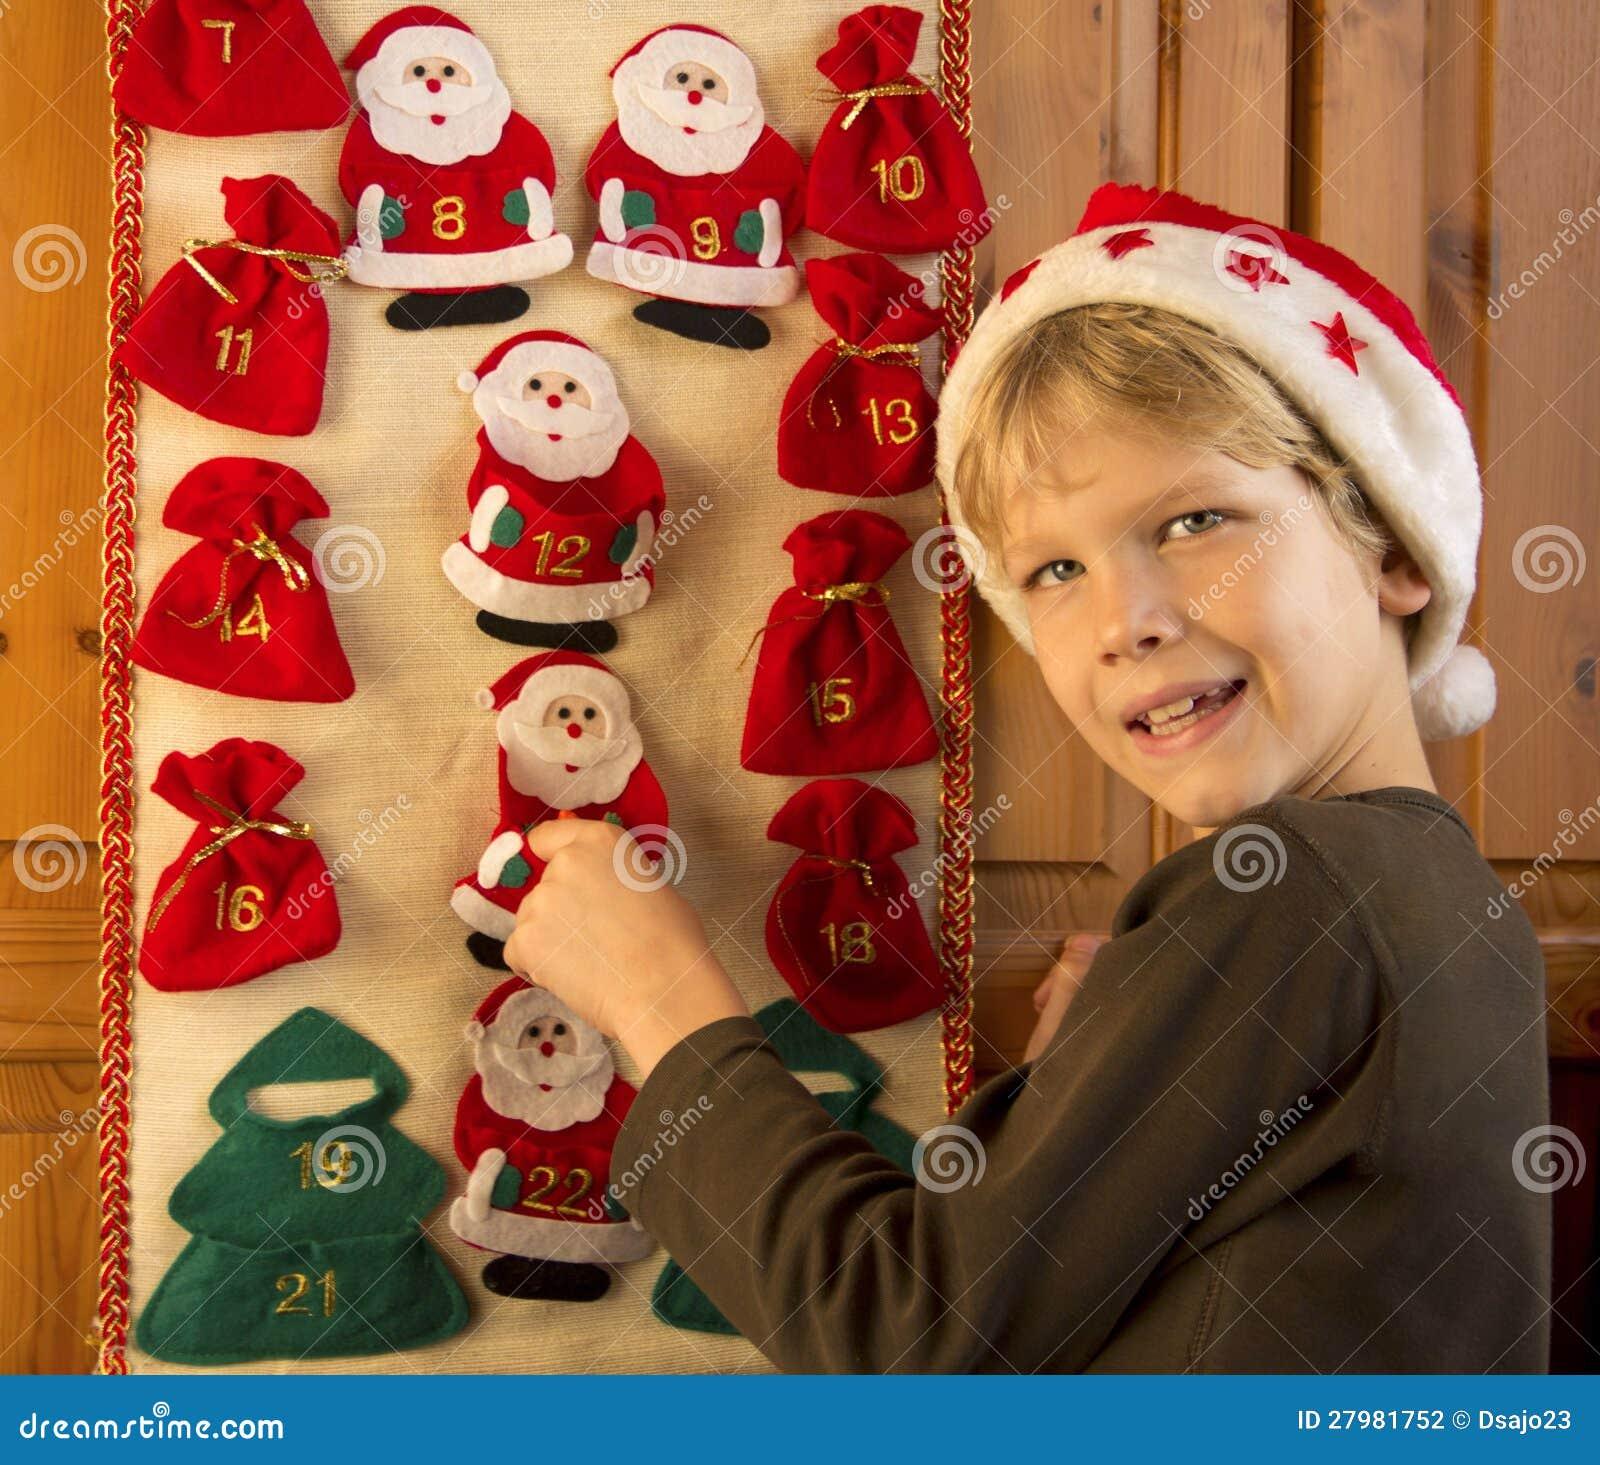 boy opening advent calendar stock photography image. Black Bedroom Furniture Sets. Home Design Ideas